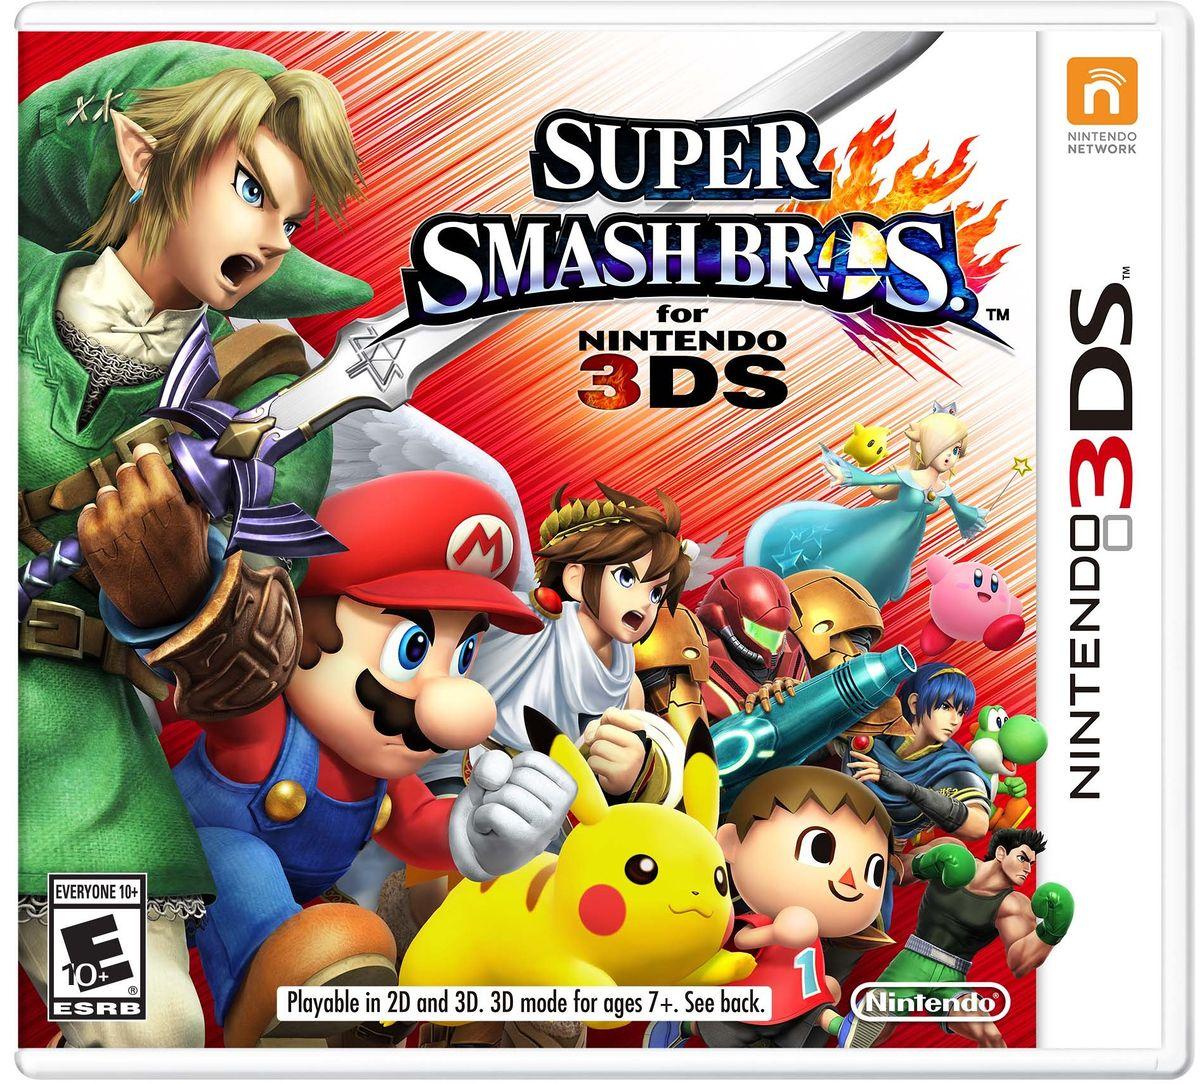 Super Smash Bros  for Nintendo 3DS - Super Mario Wiki, the Mario